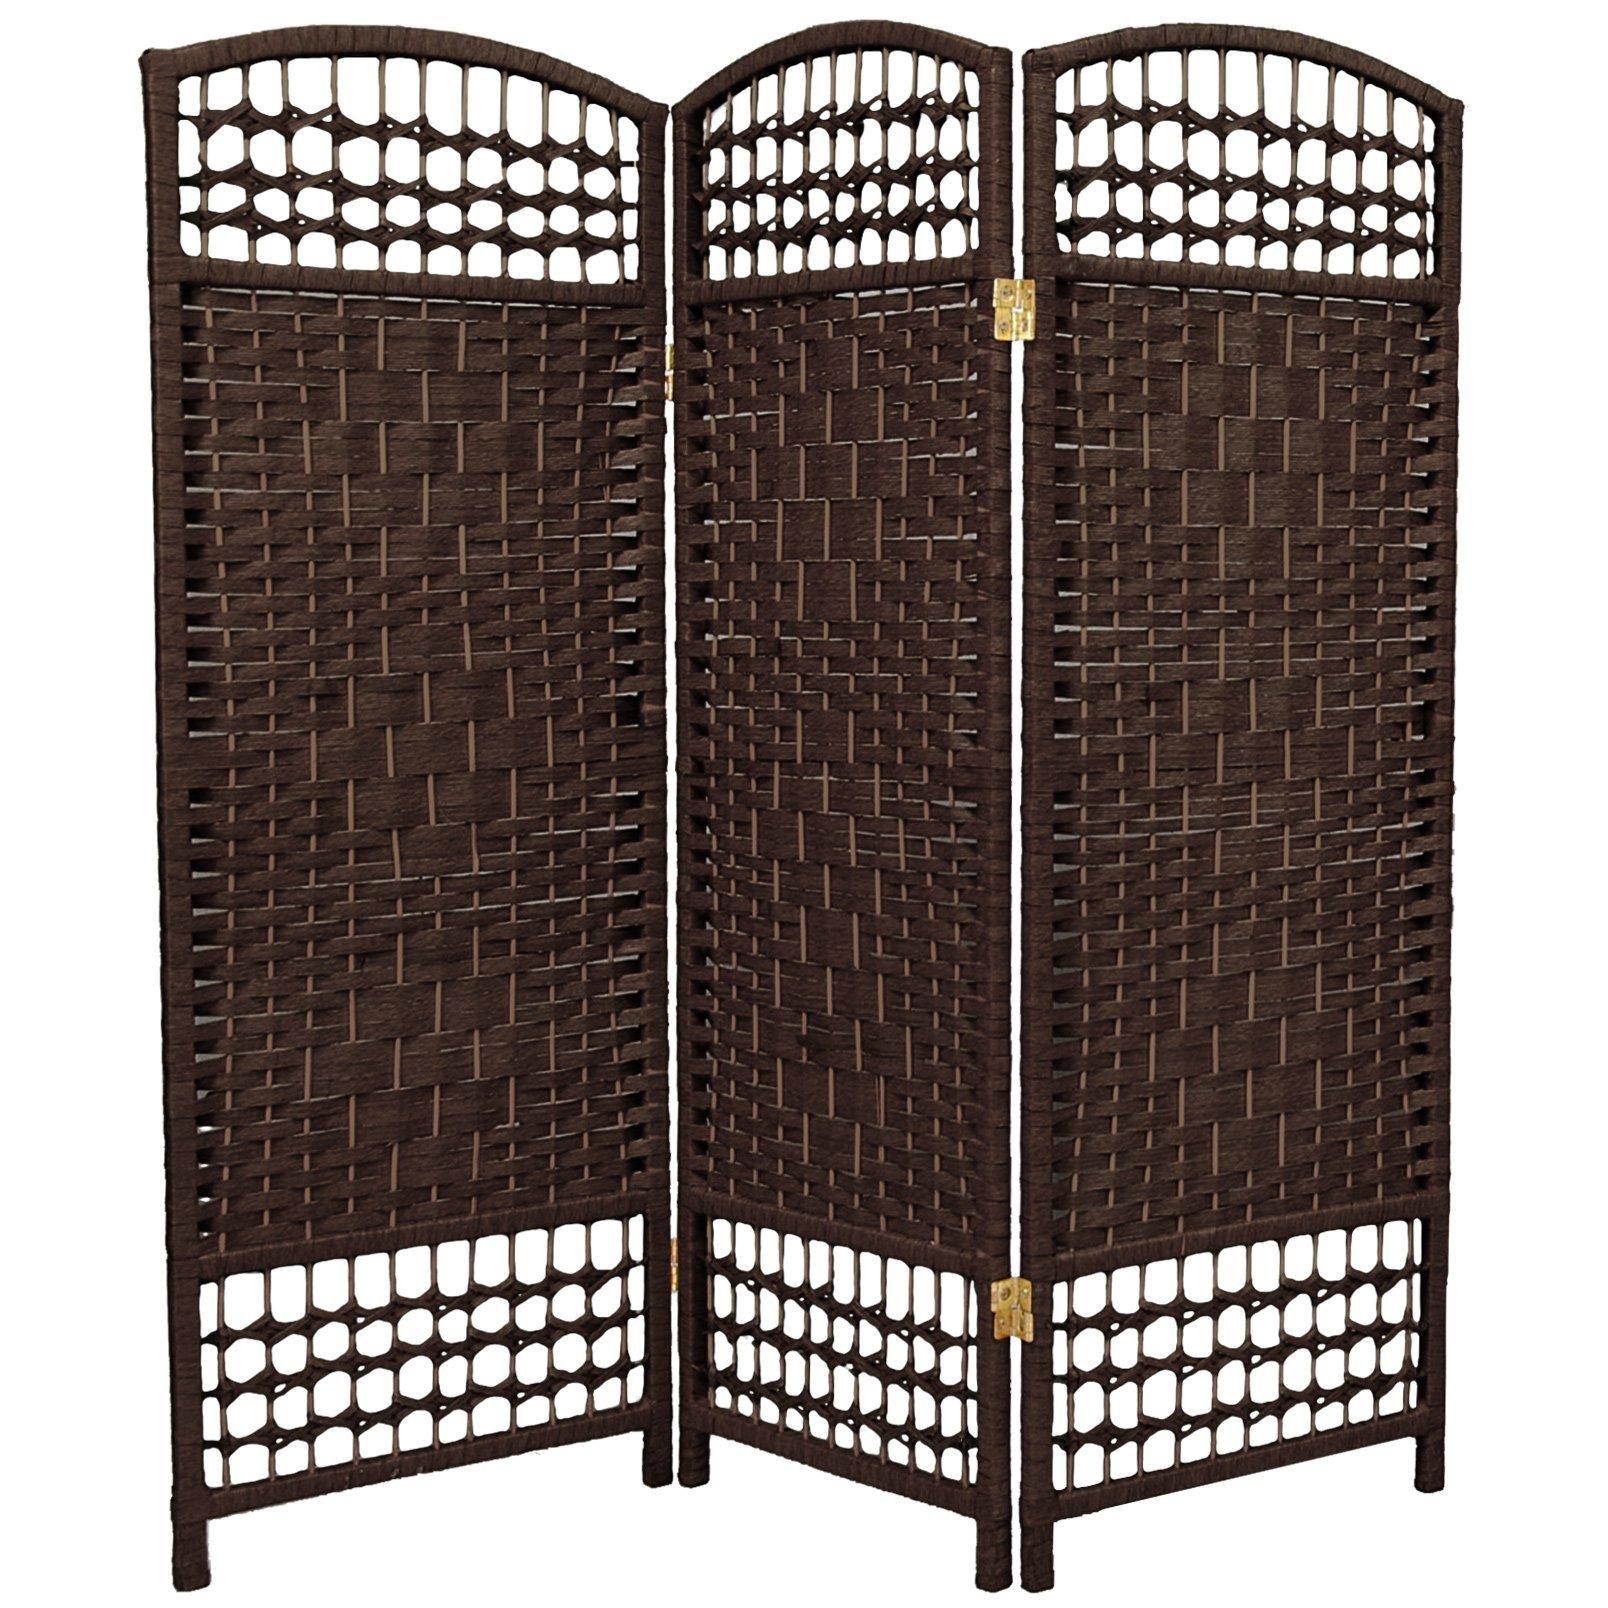 ORIENTAL FURNITURE 4 ft. Tall Fiber Weave Room Divider - Dark Mocha - 3 Panels